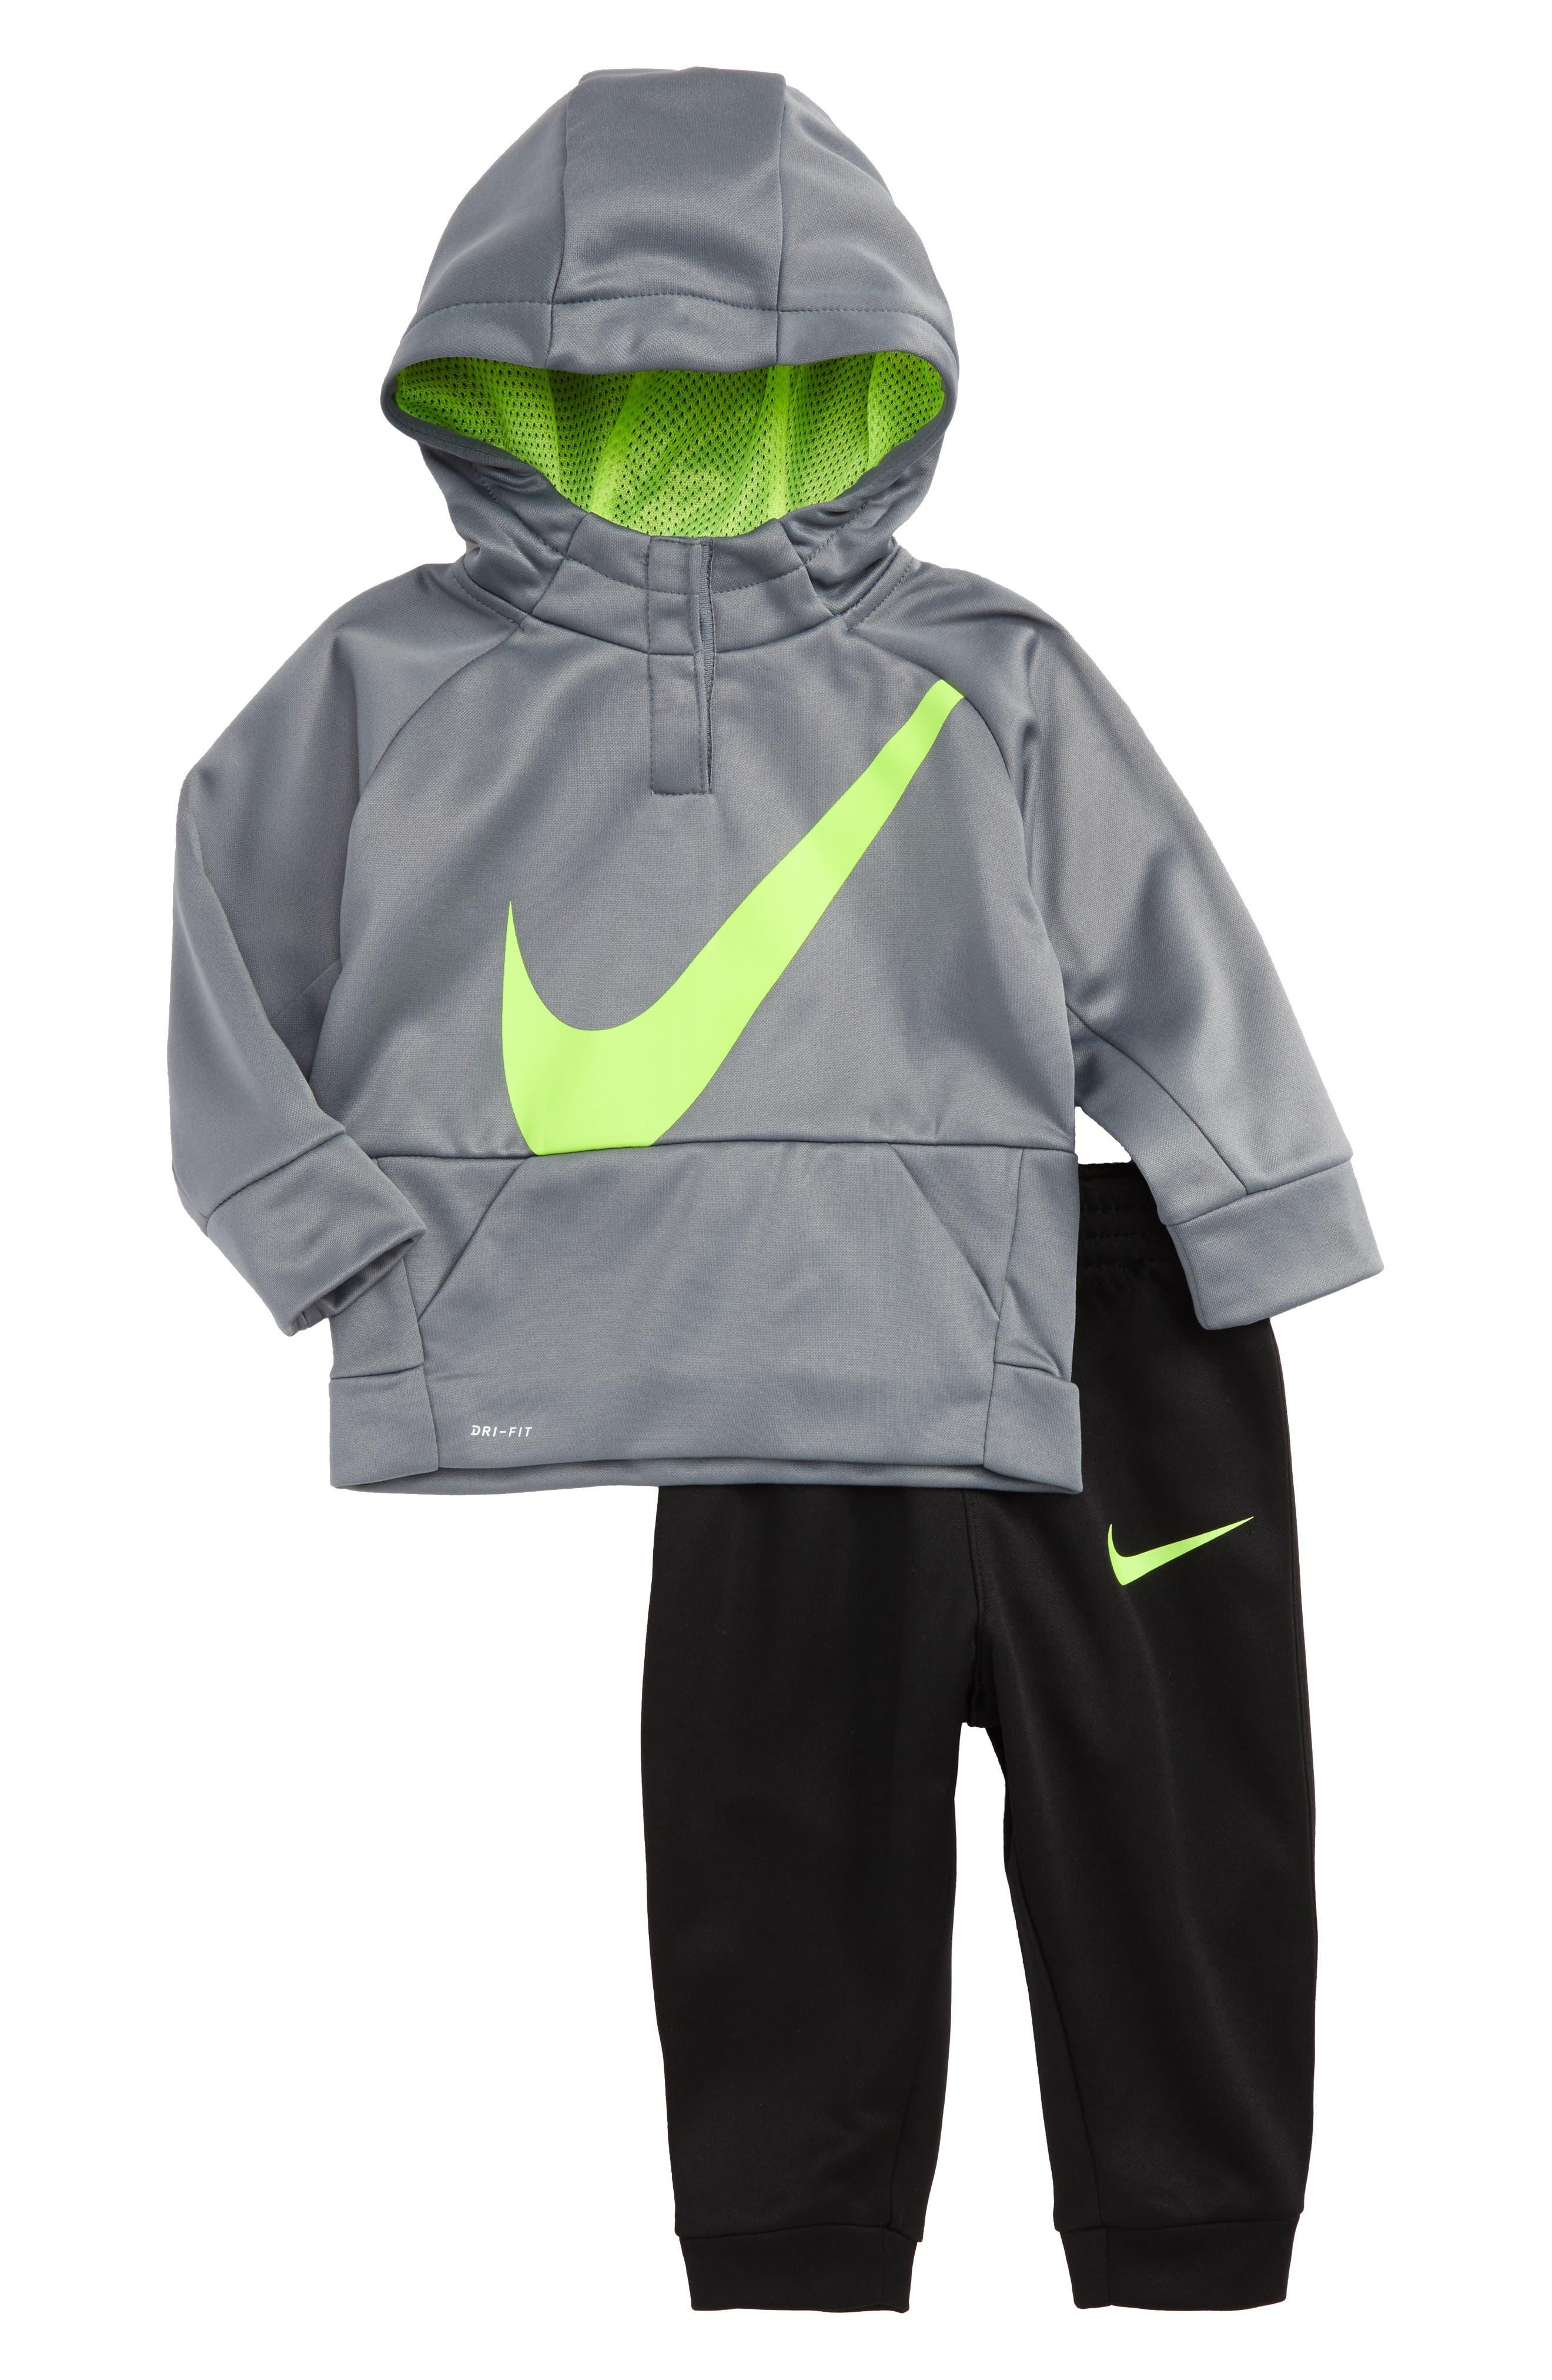 Main Image - Nike Swoosh Therma-FIT Oversize Hoodie & Pants Set (Baby Boys)